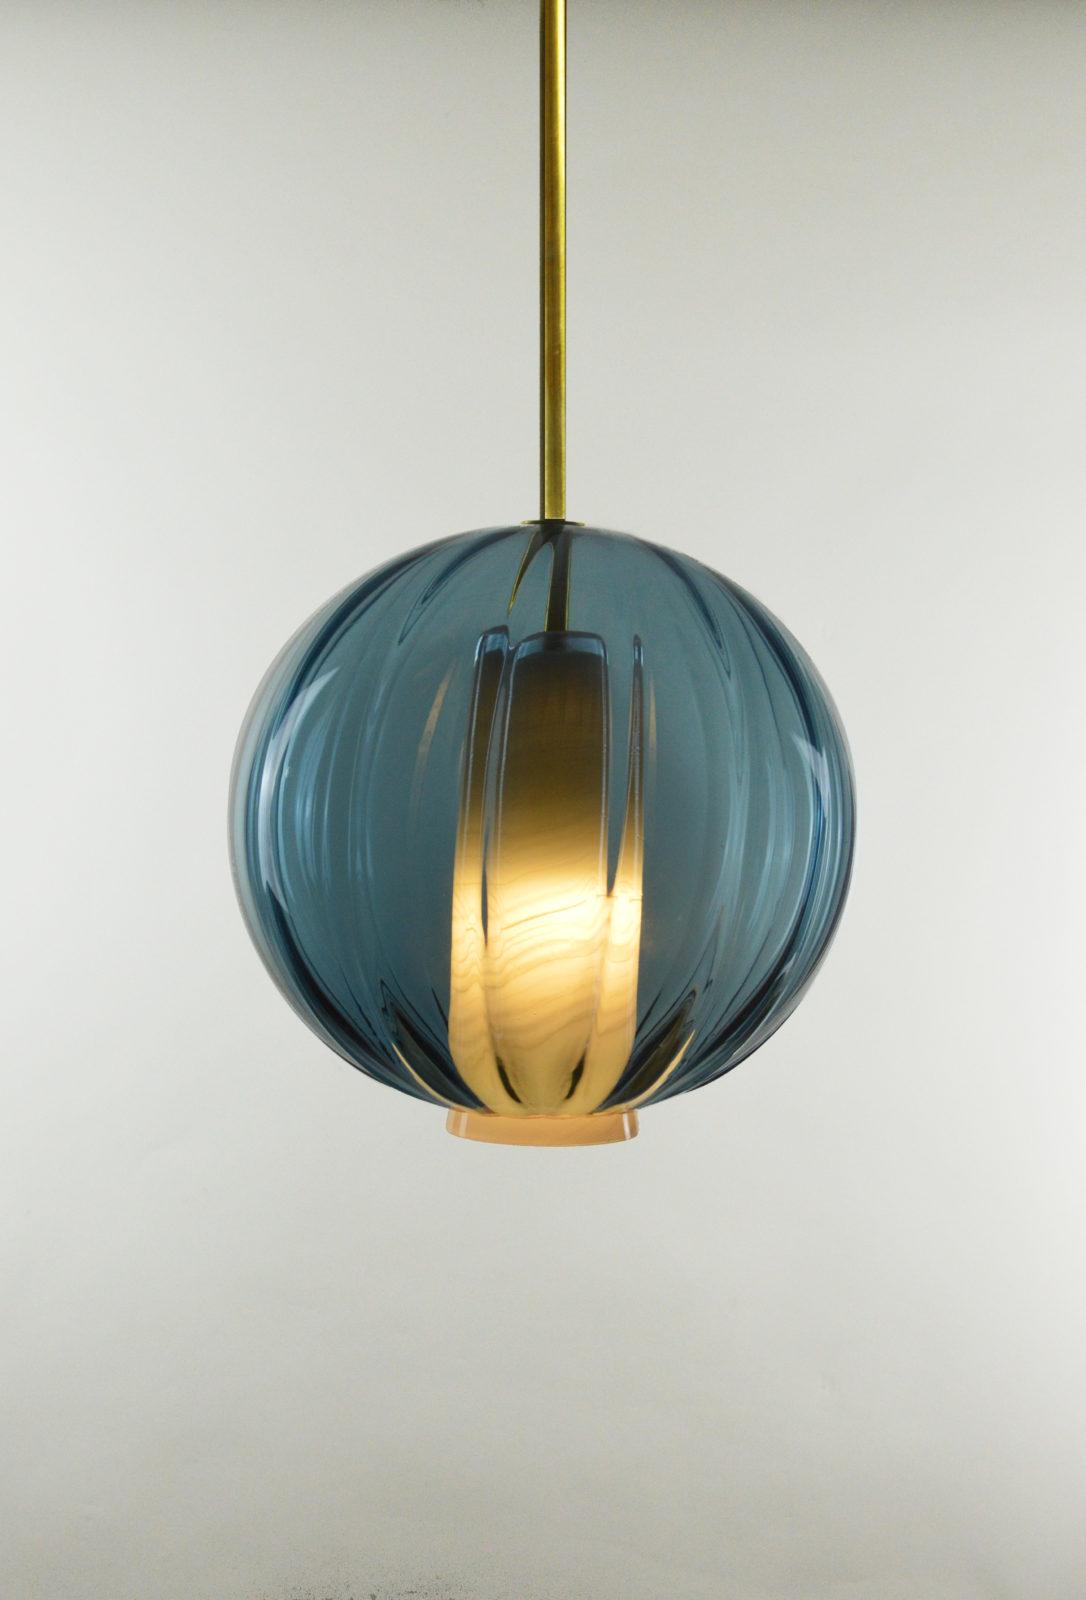 Atelier George-Collection Moire-Globe bleu-océan allumé – Atelier George